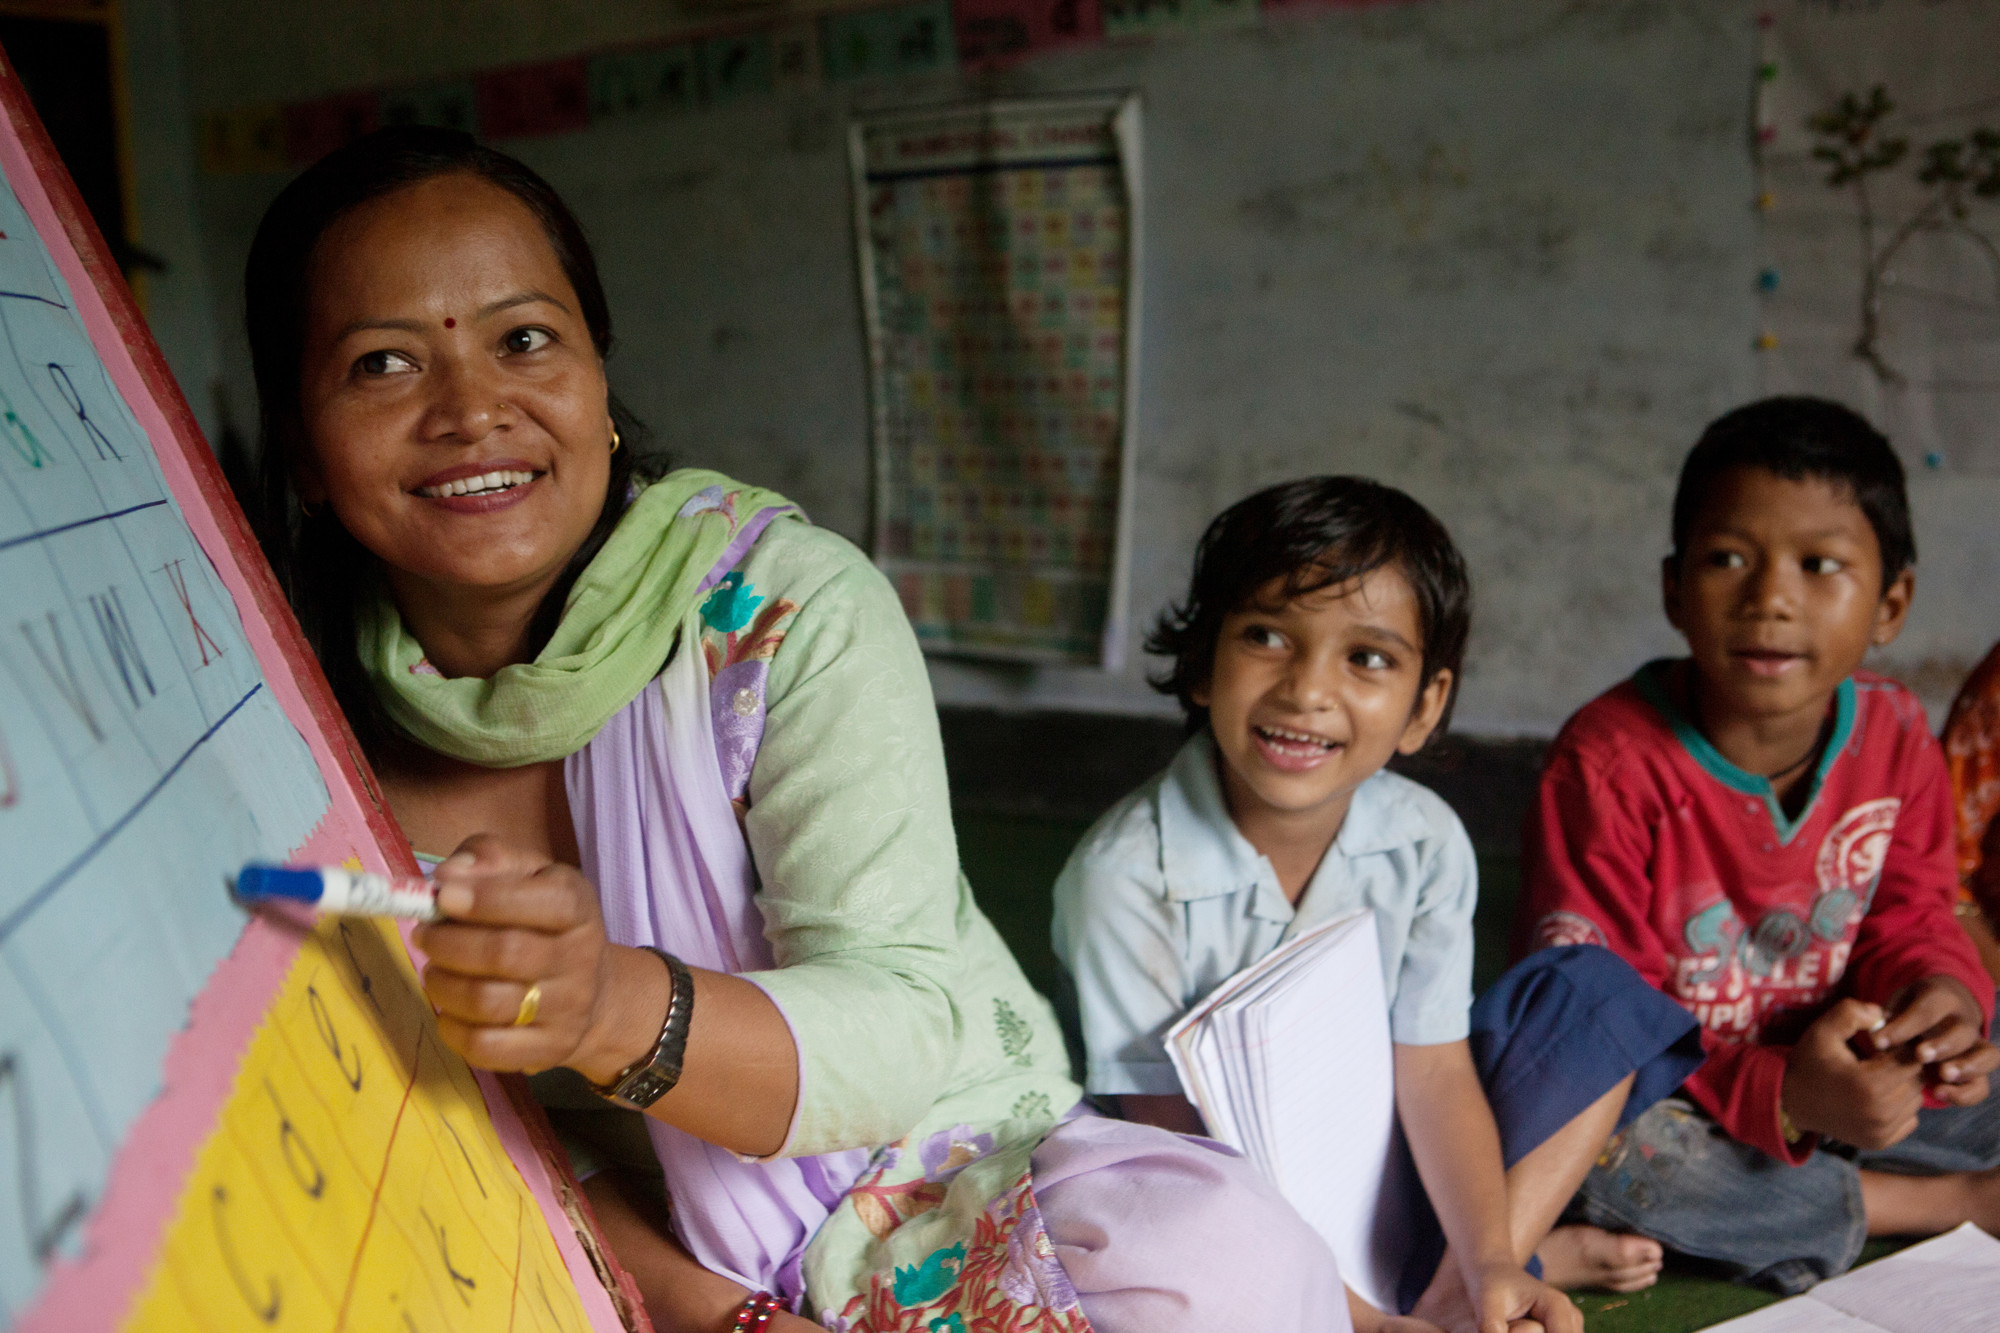 Teaching and education volunteering jobs - teaching charity